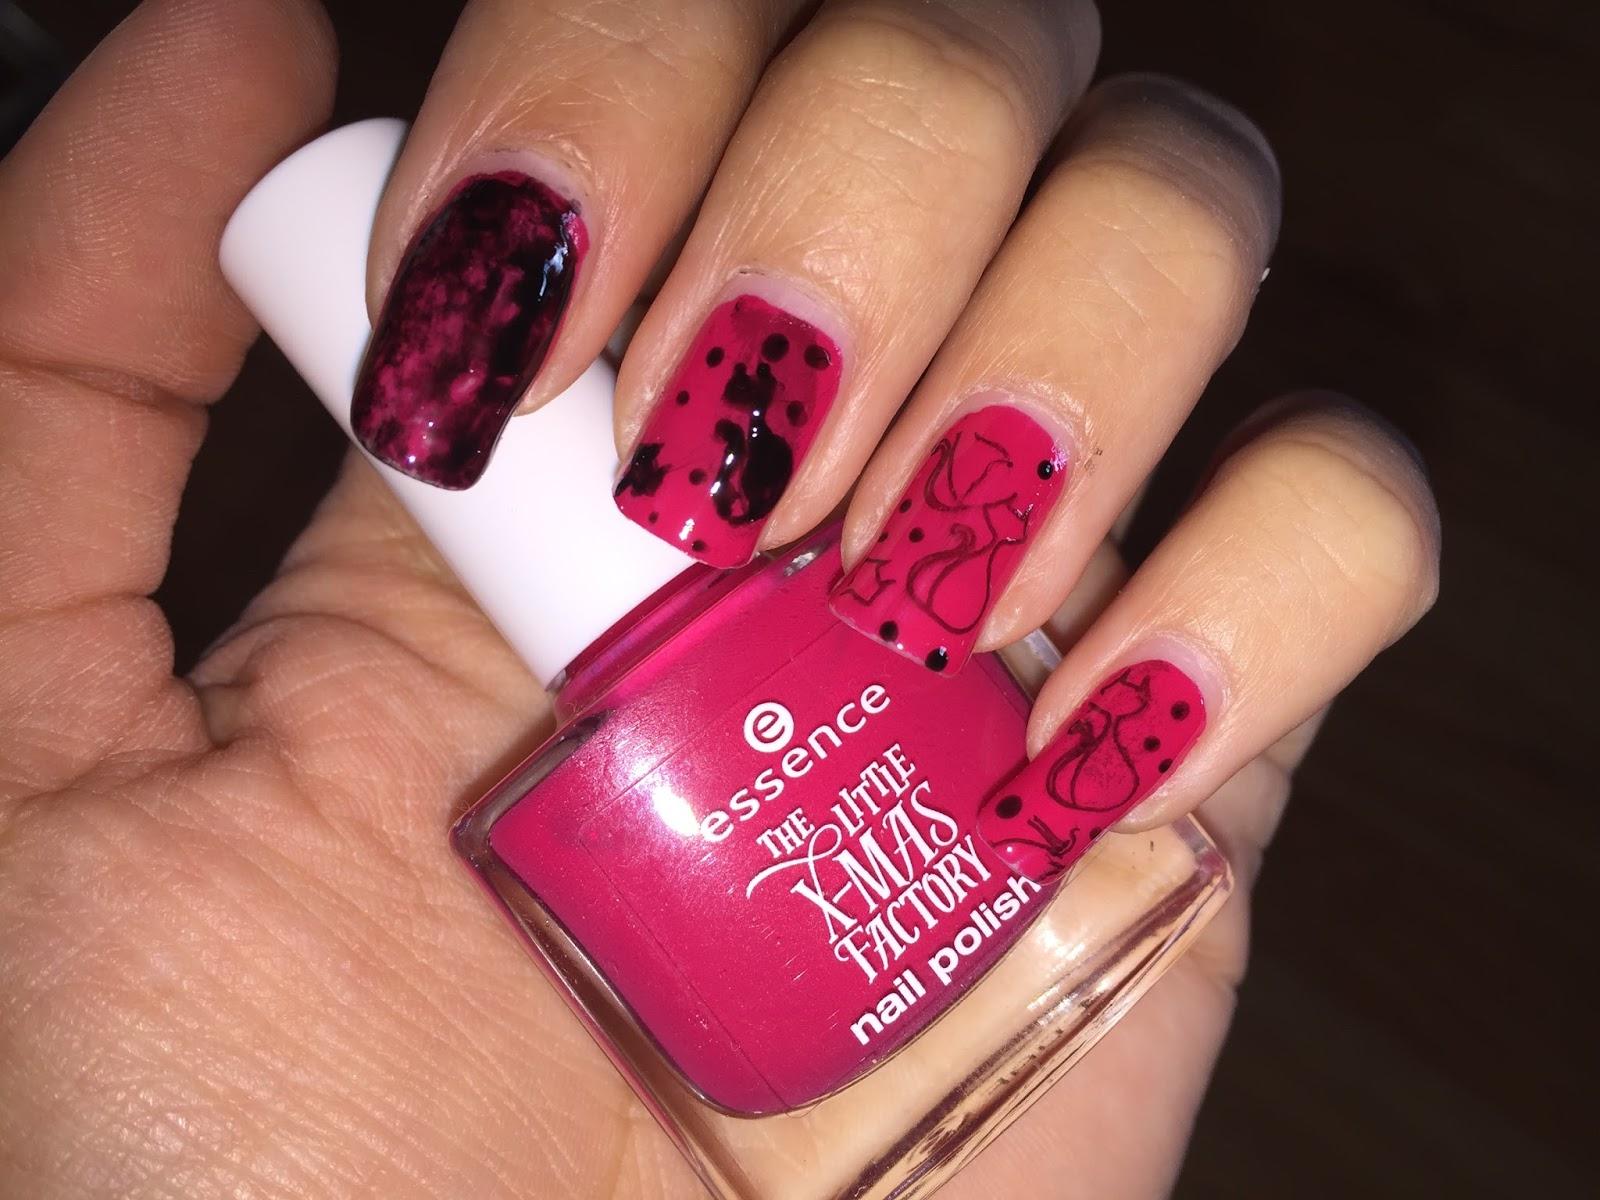 FairyAna: January nail art challenge: Animals